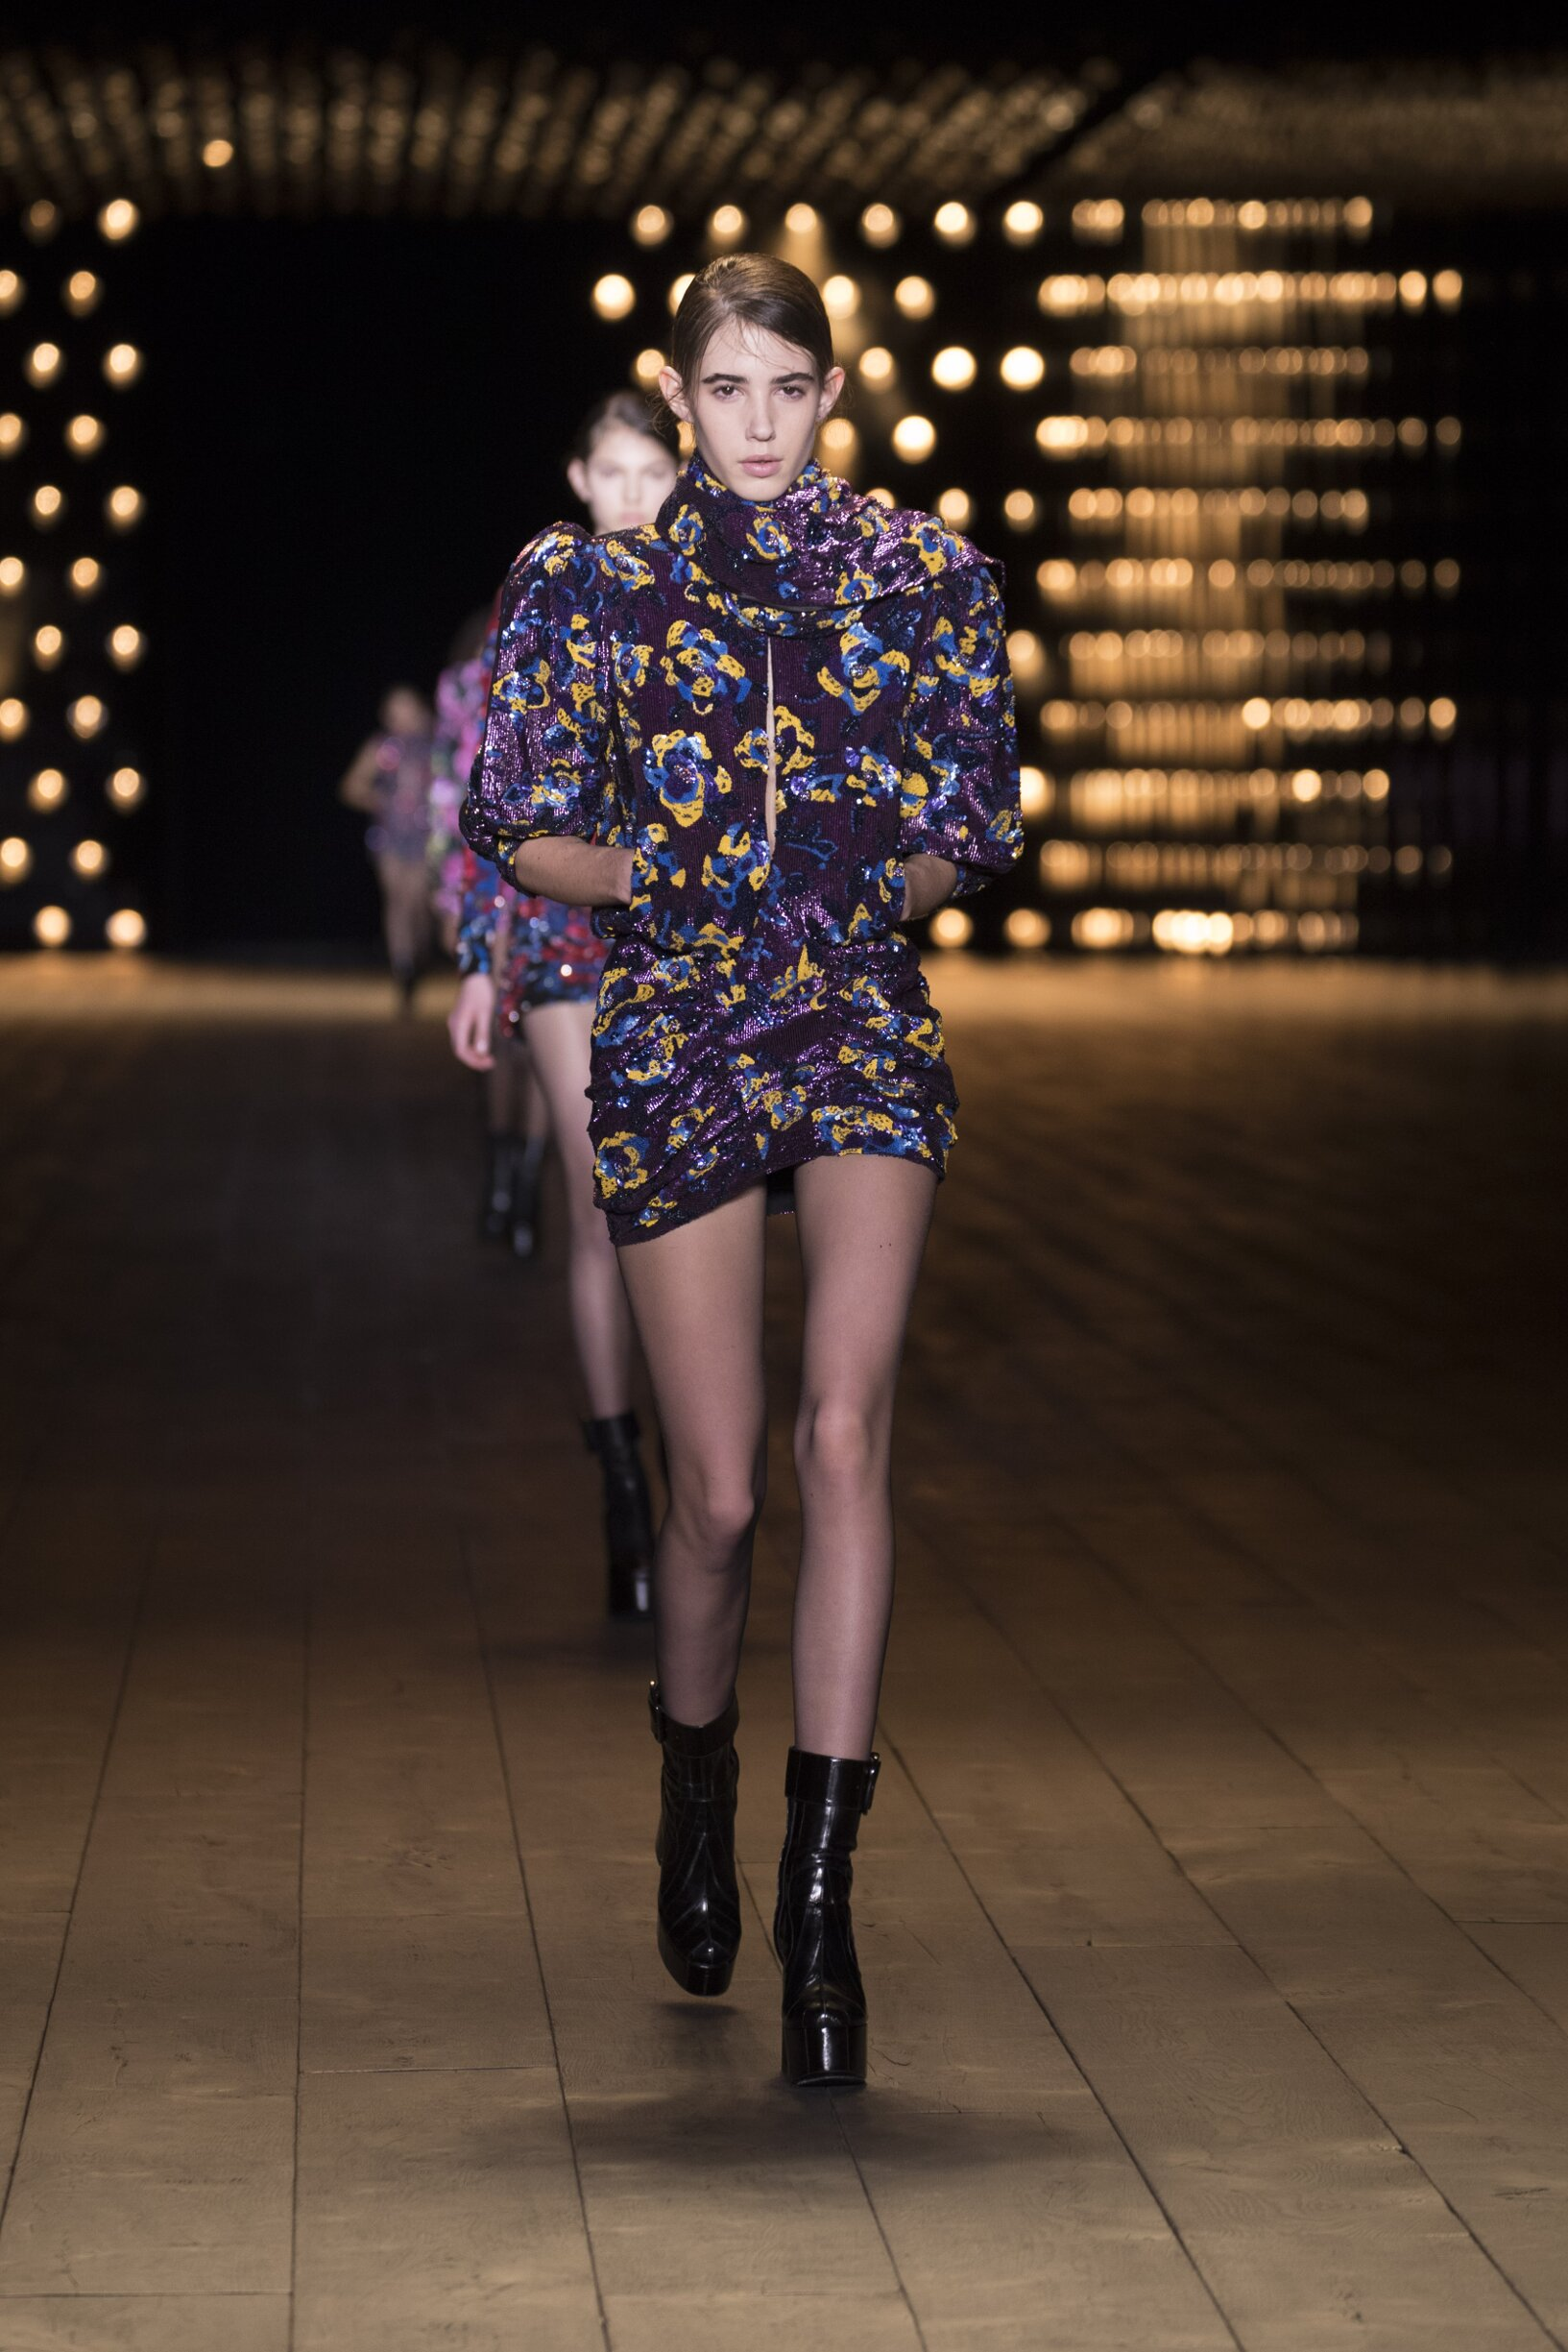 Model Fashion Week 2018 Catwalk Saint Laurent